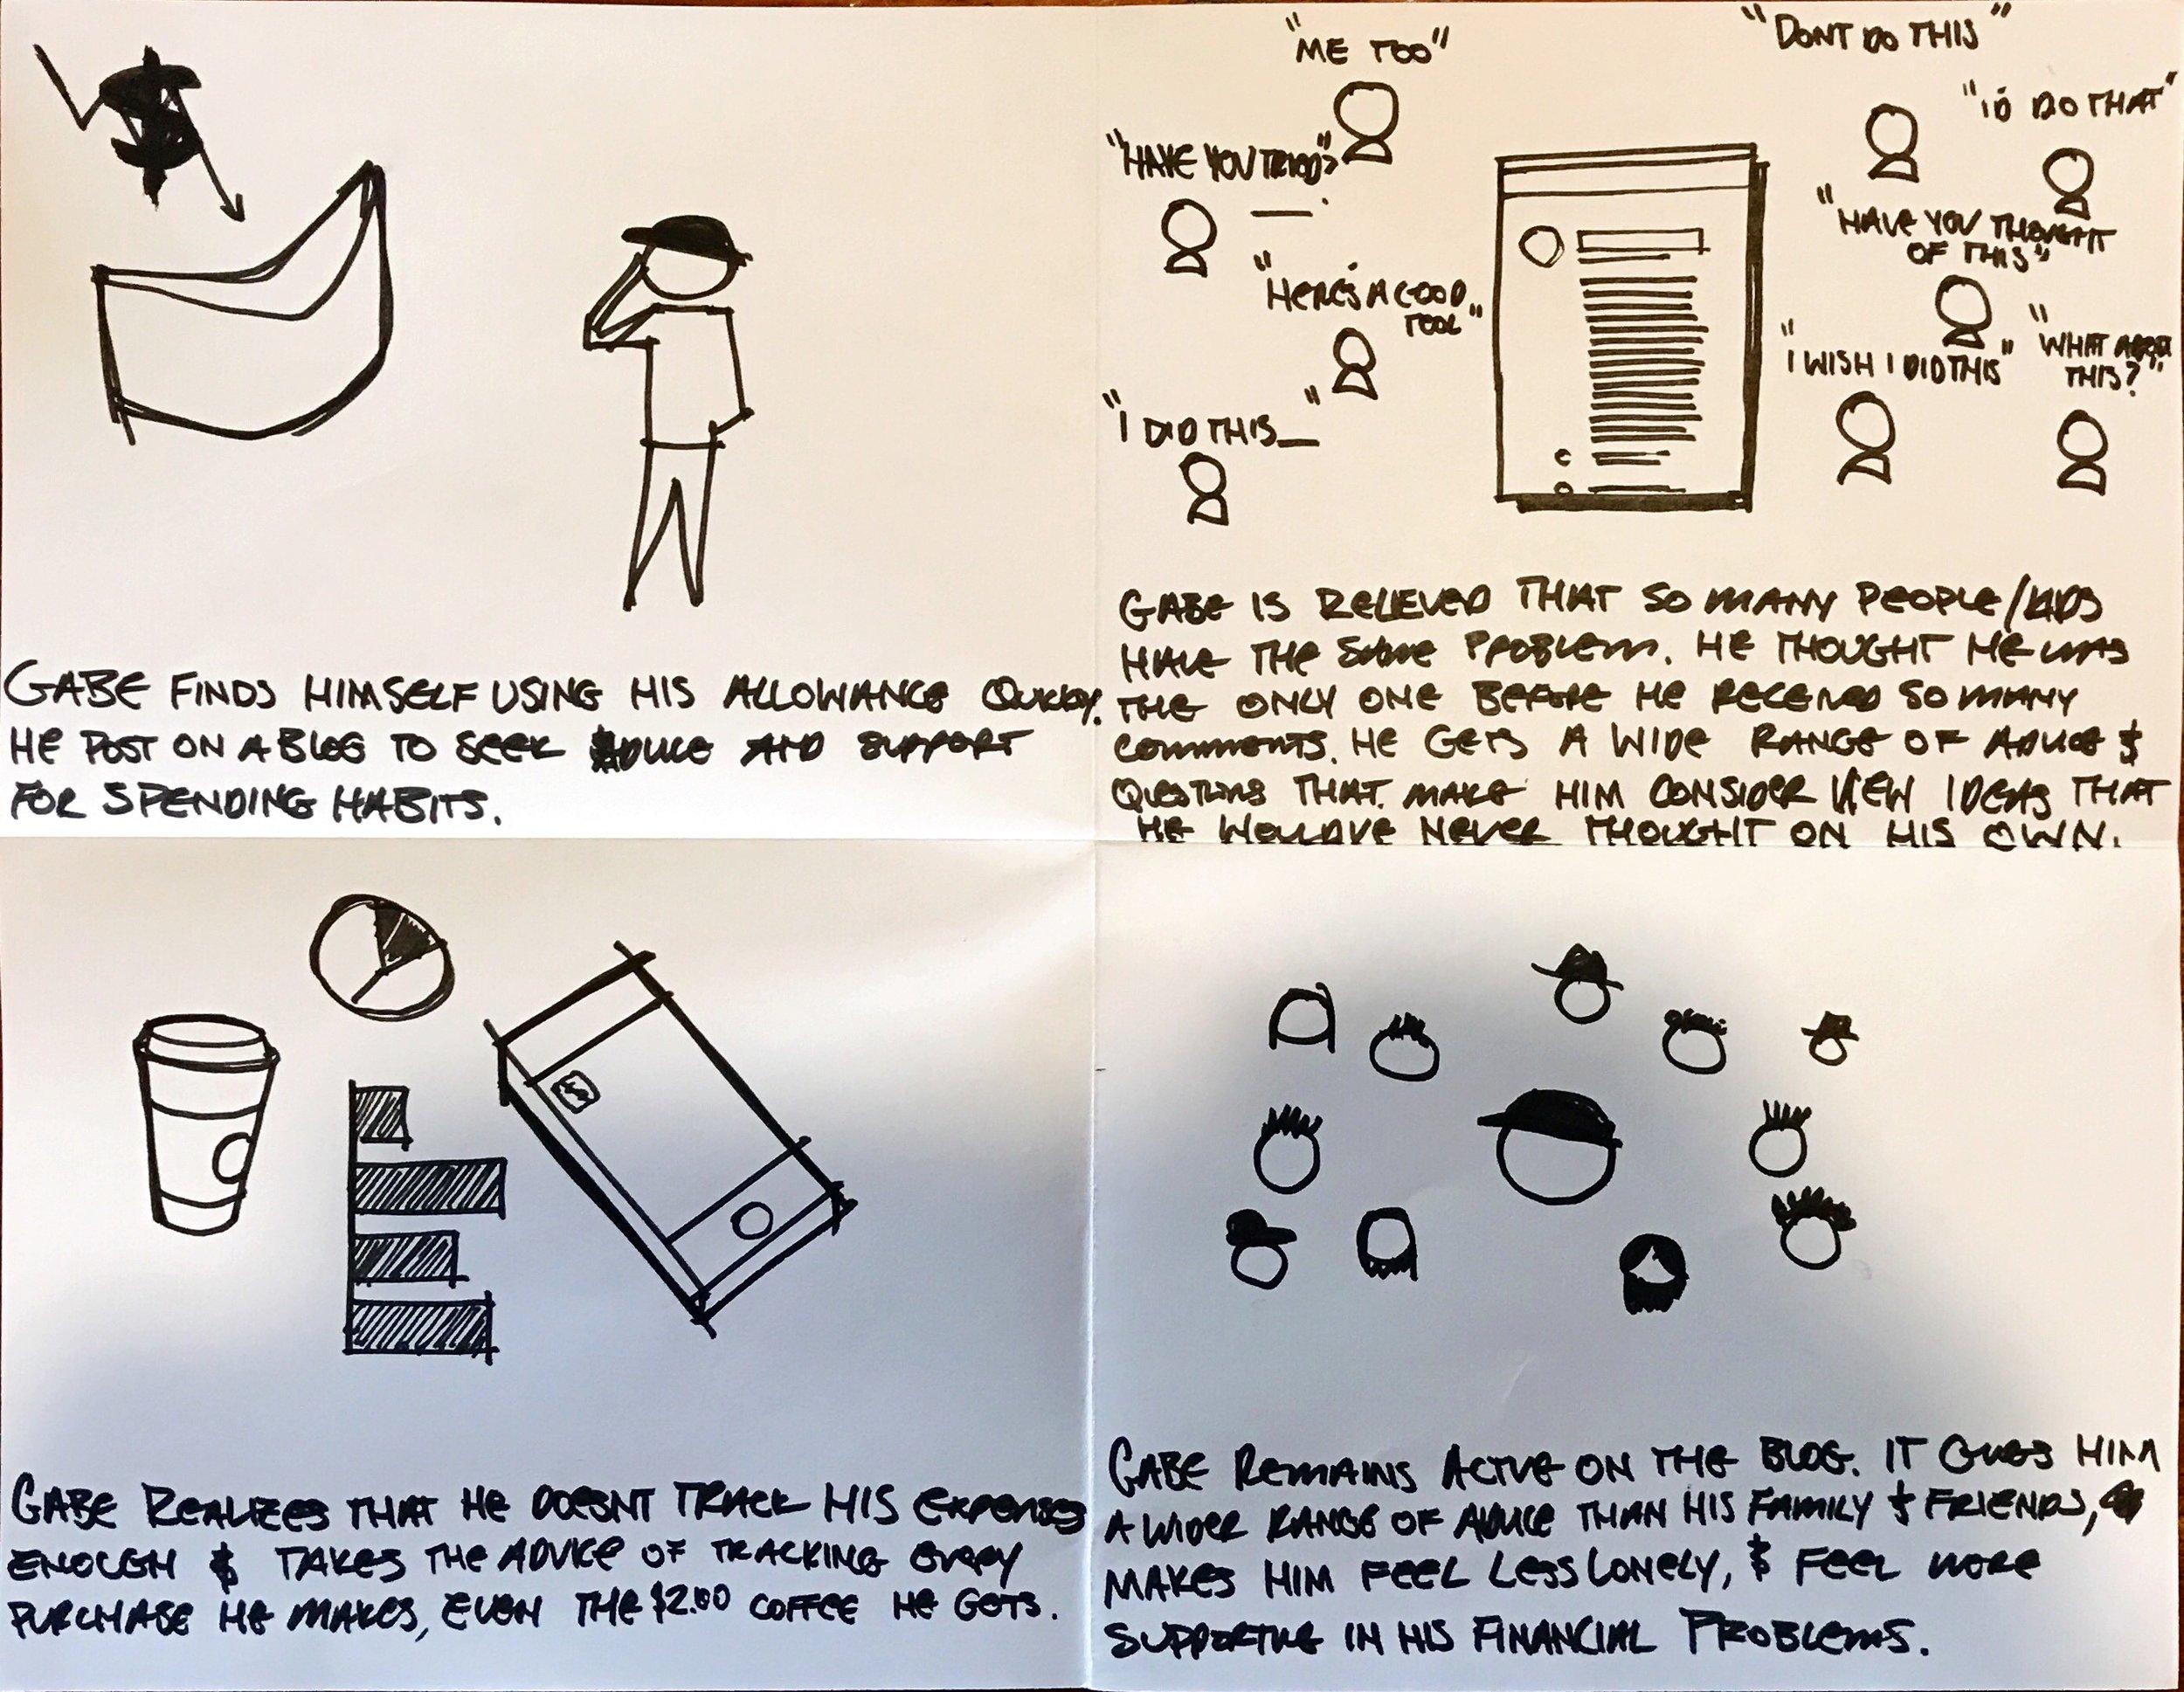 4_storyboard1.JPG